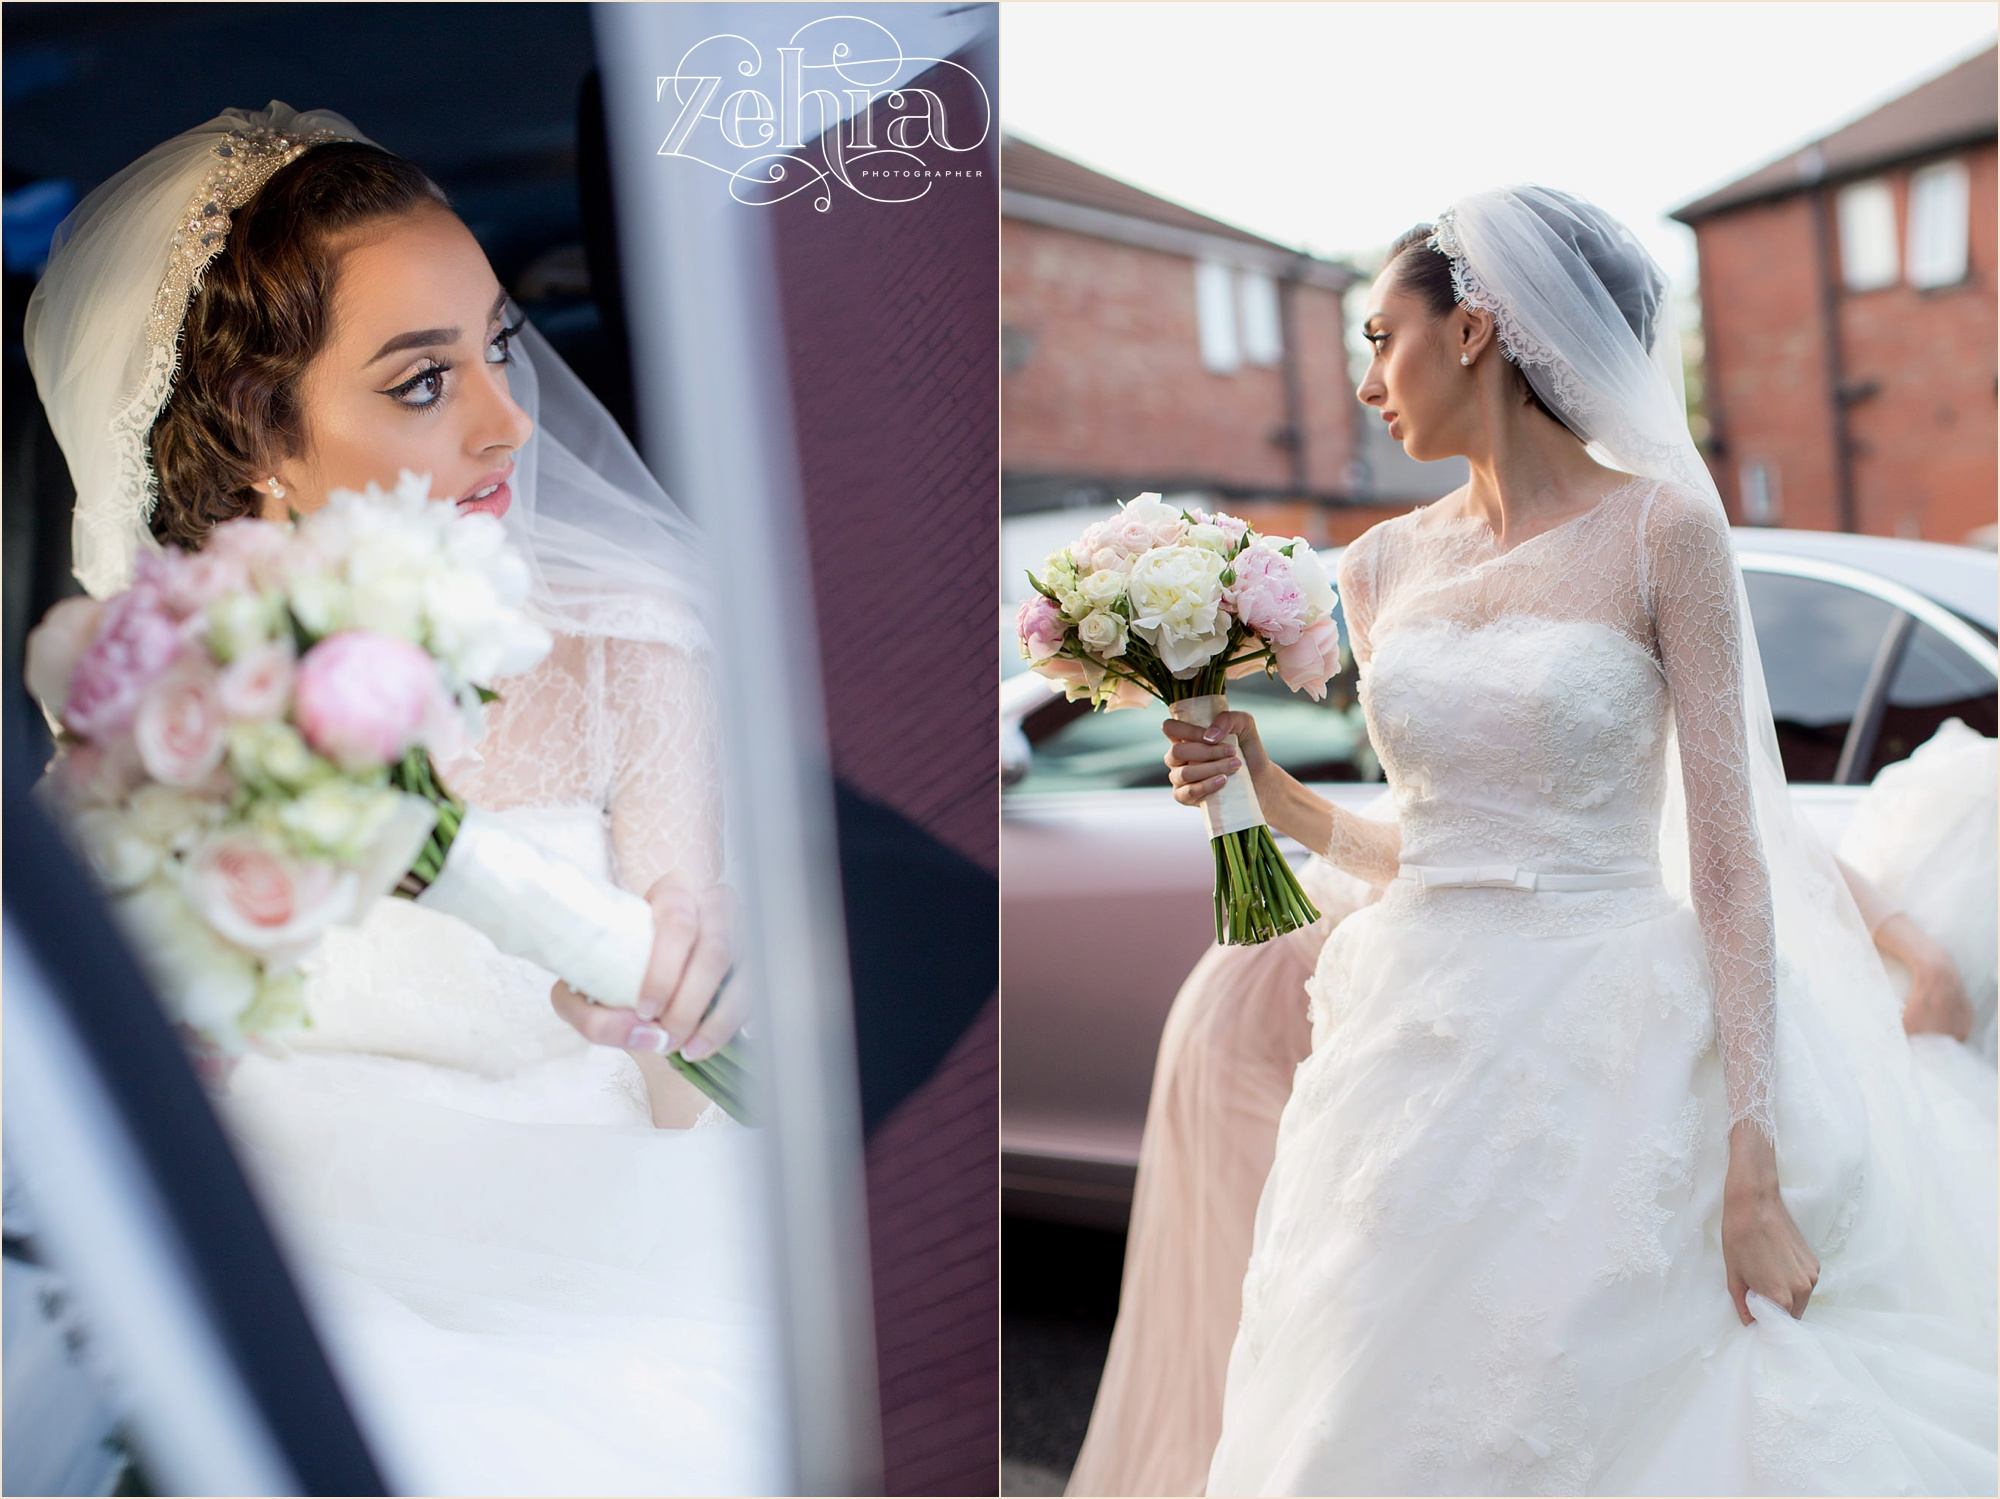 jasira manchester wedding photographer_0034.jpg